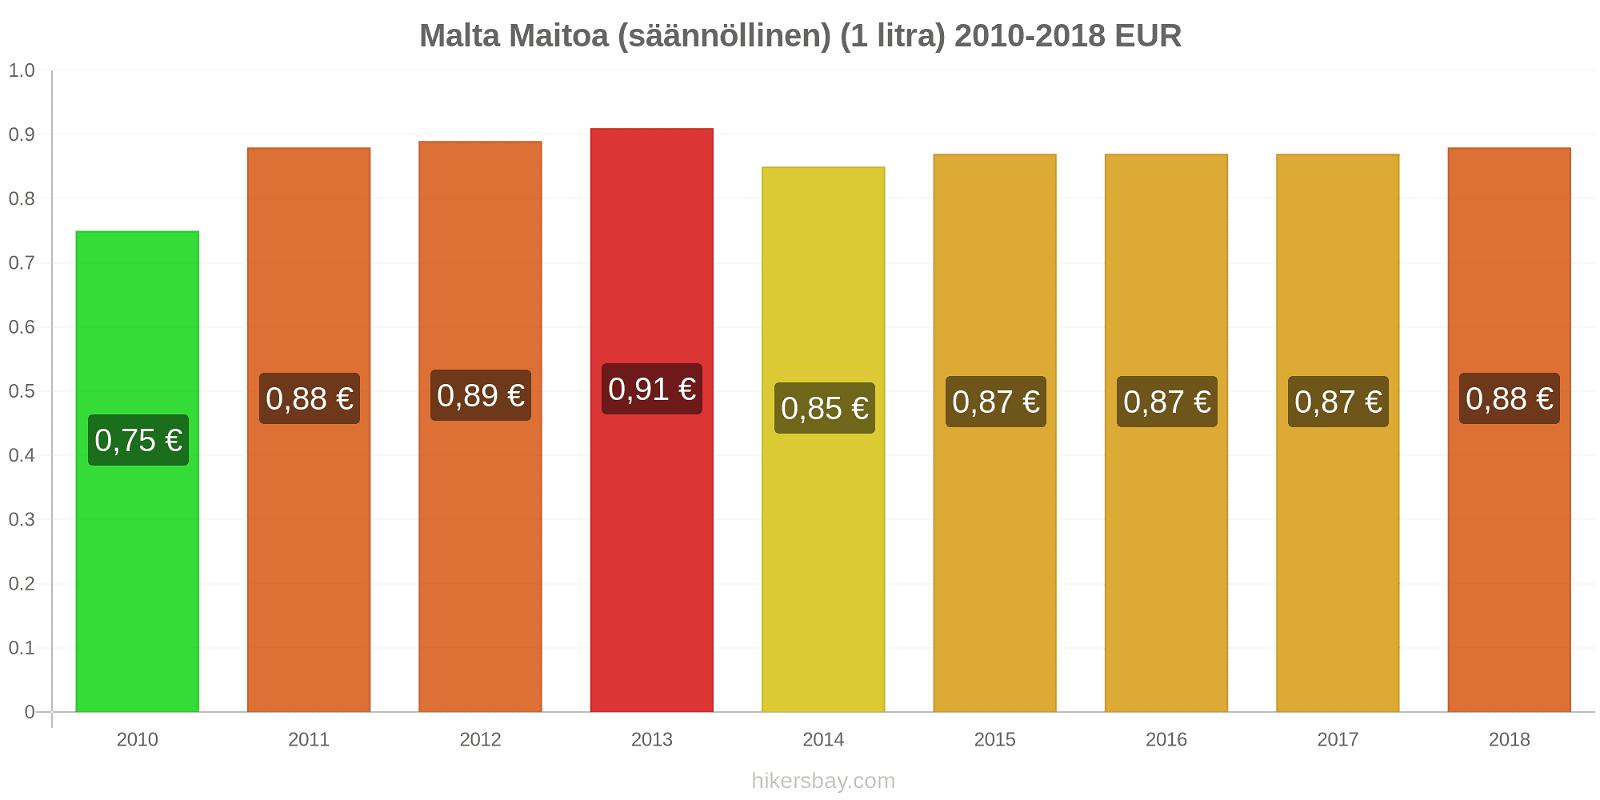 Malta hintojen muutokset Maitoa (säännöllinen) (1 litra) hikersbay.com